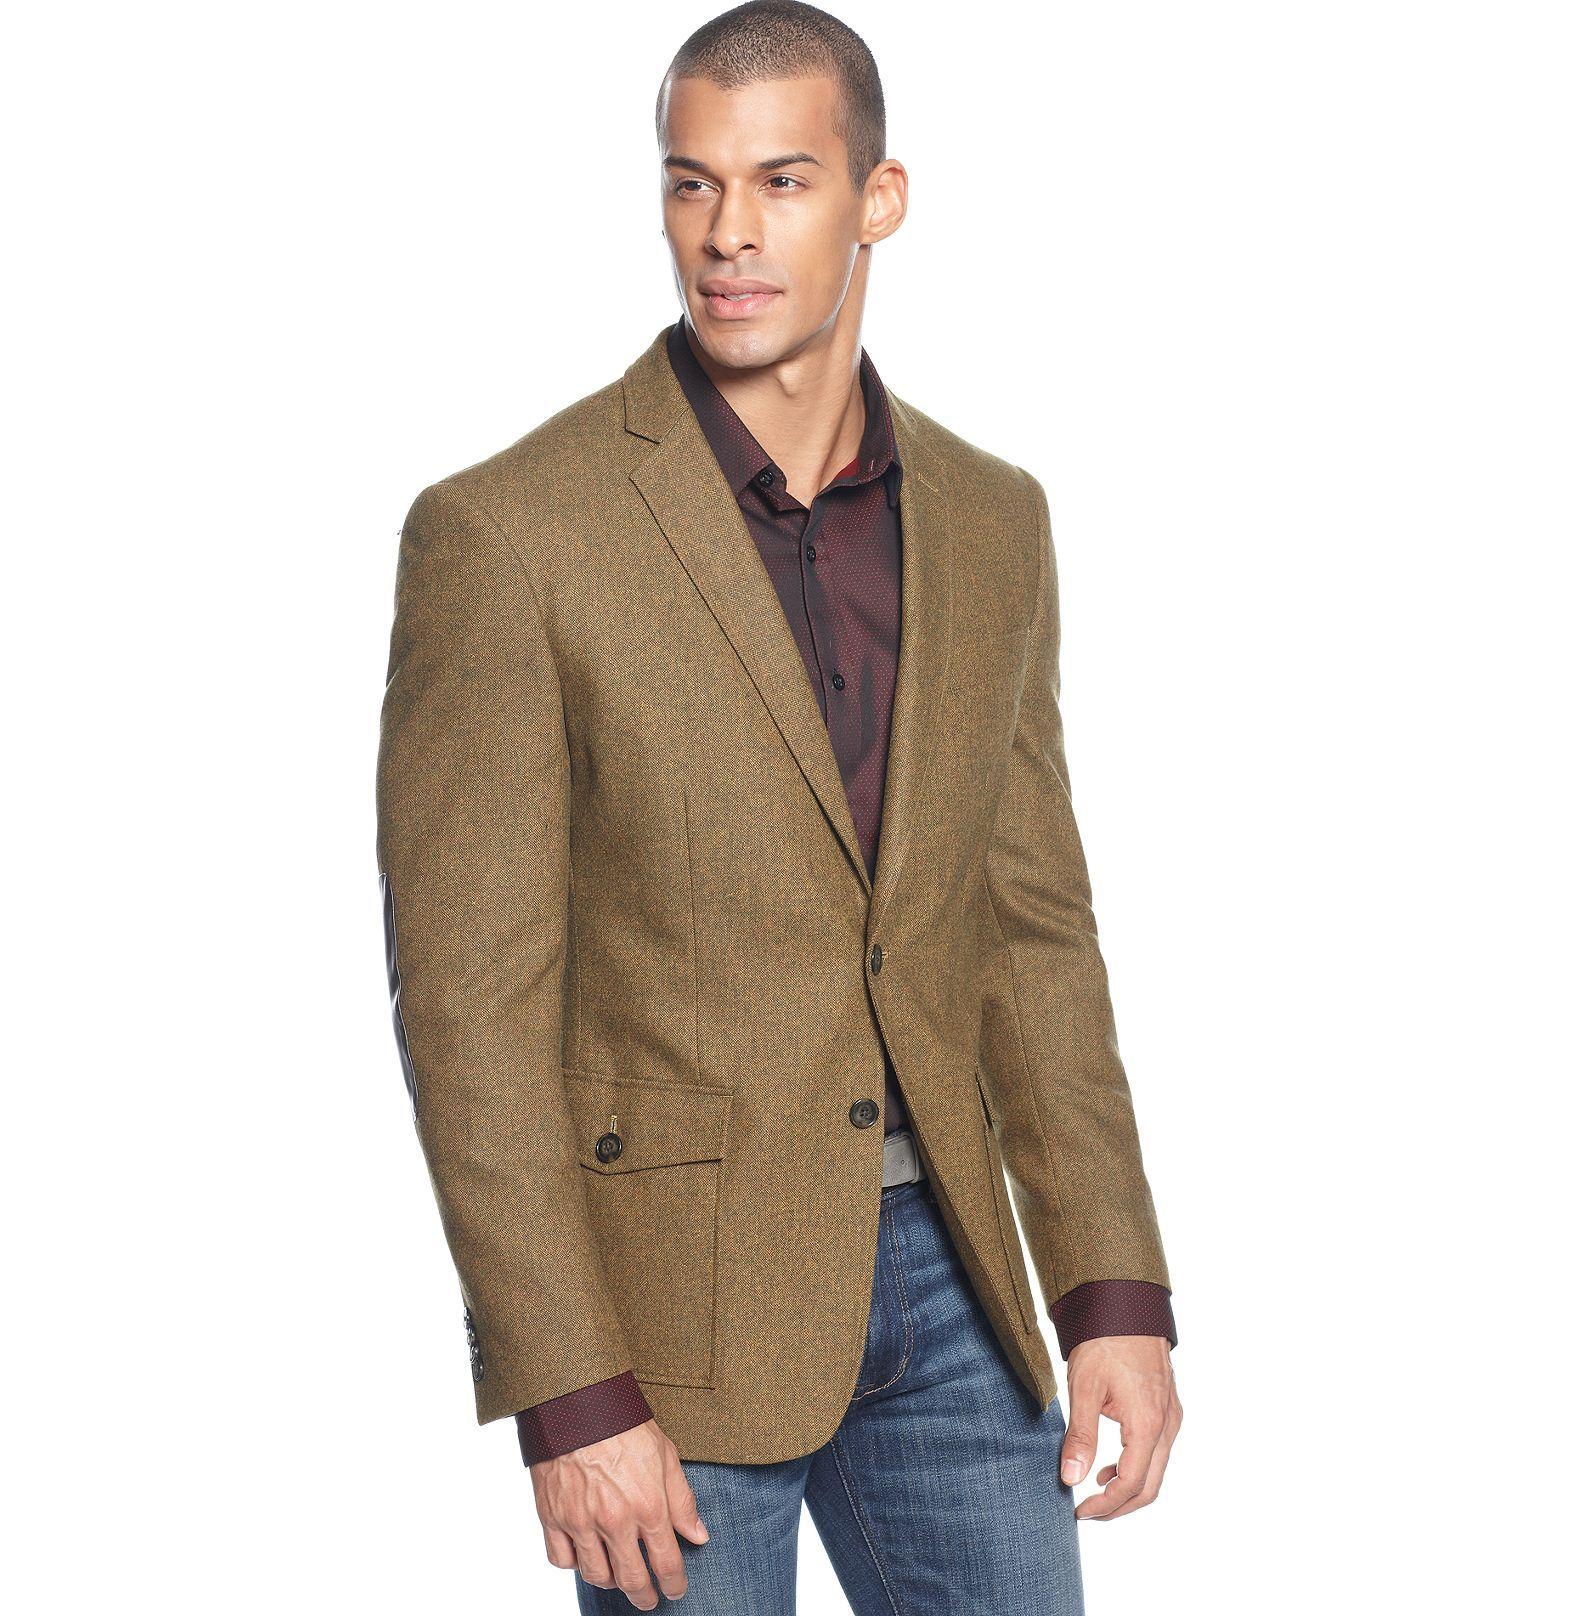 Sean John Jacket, Tweed Blazer with Elbow Patches